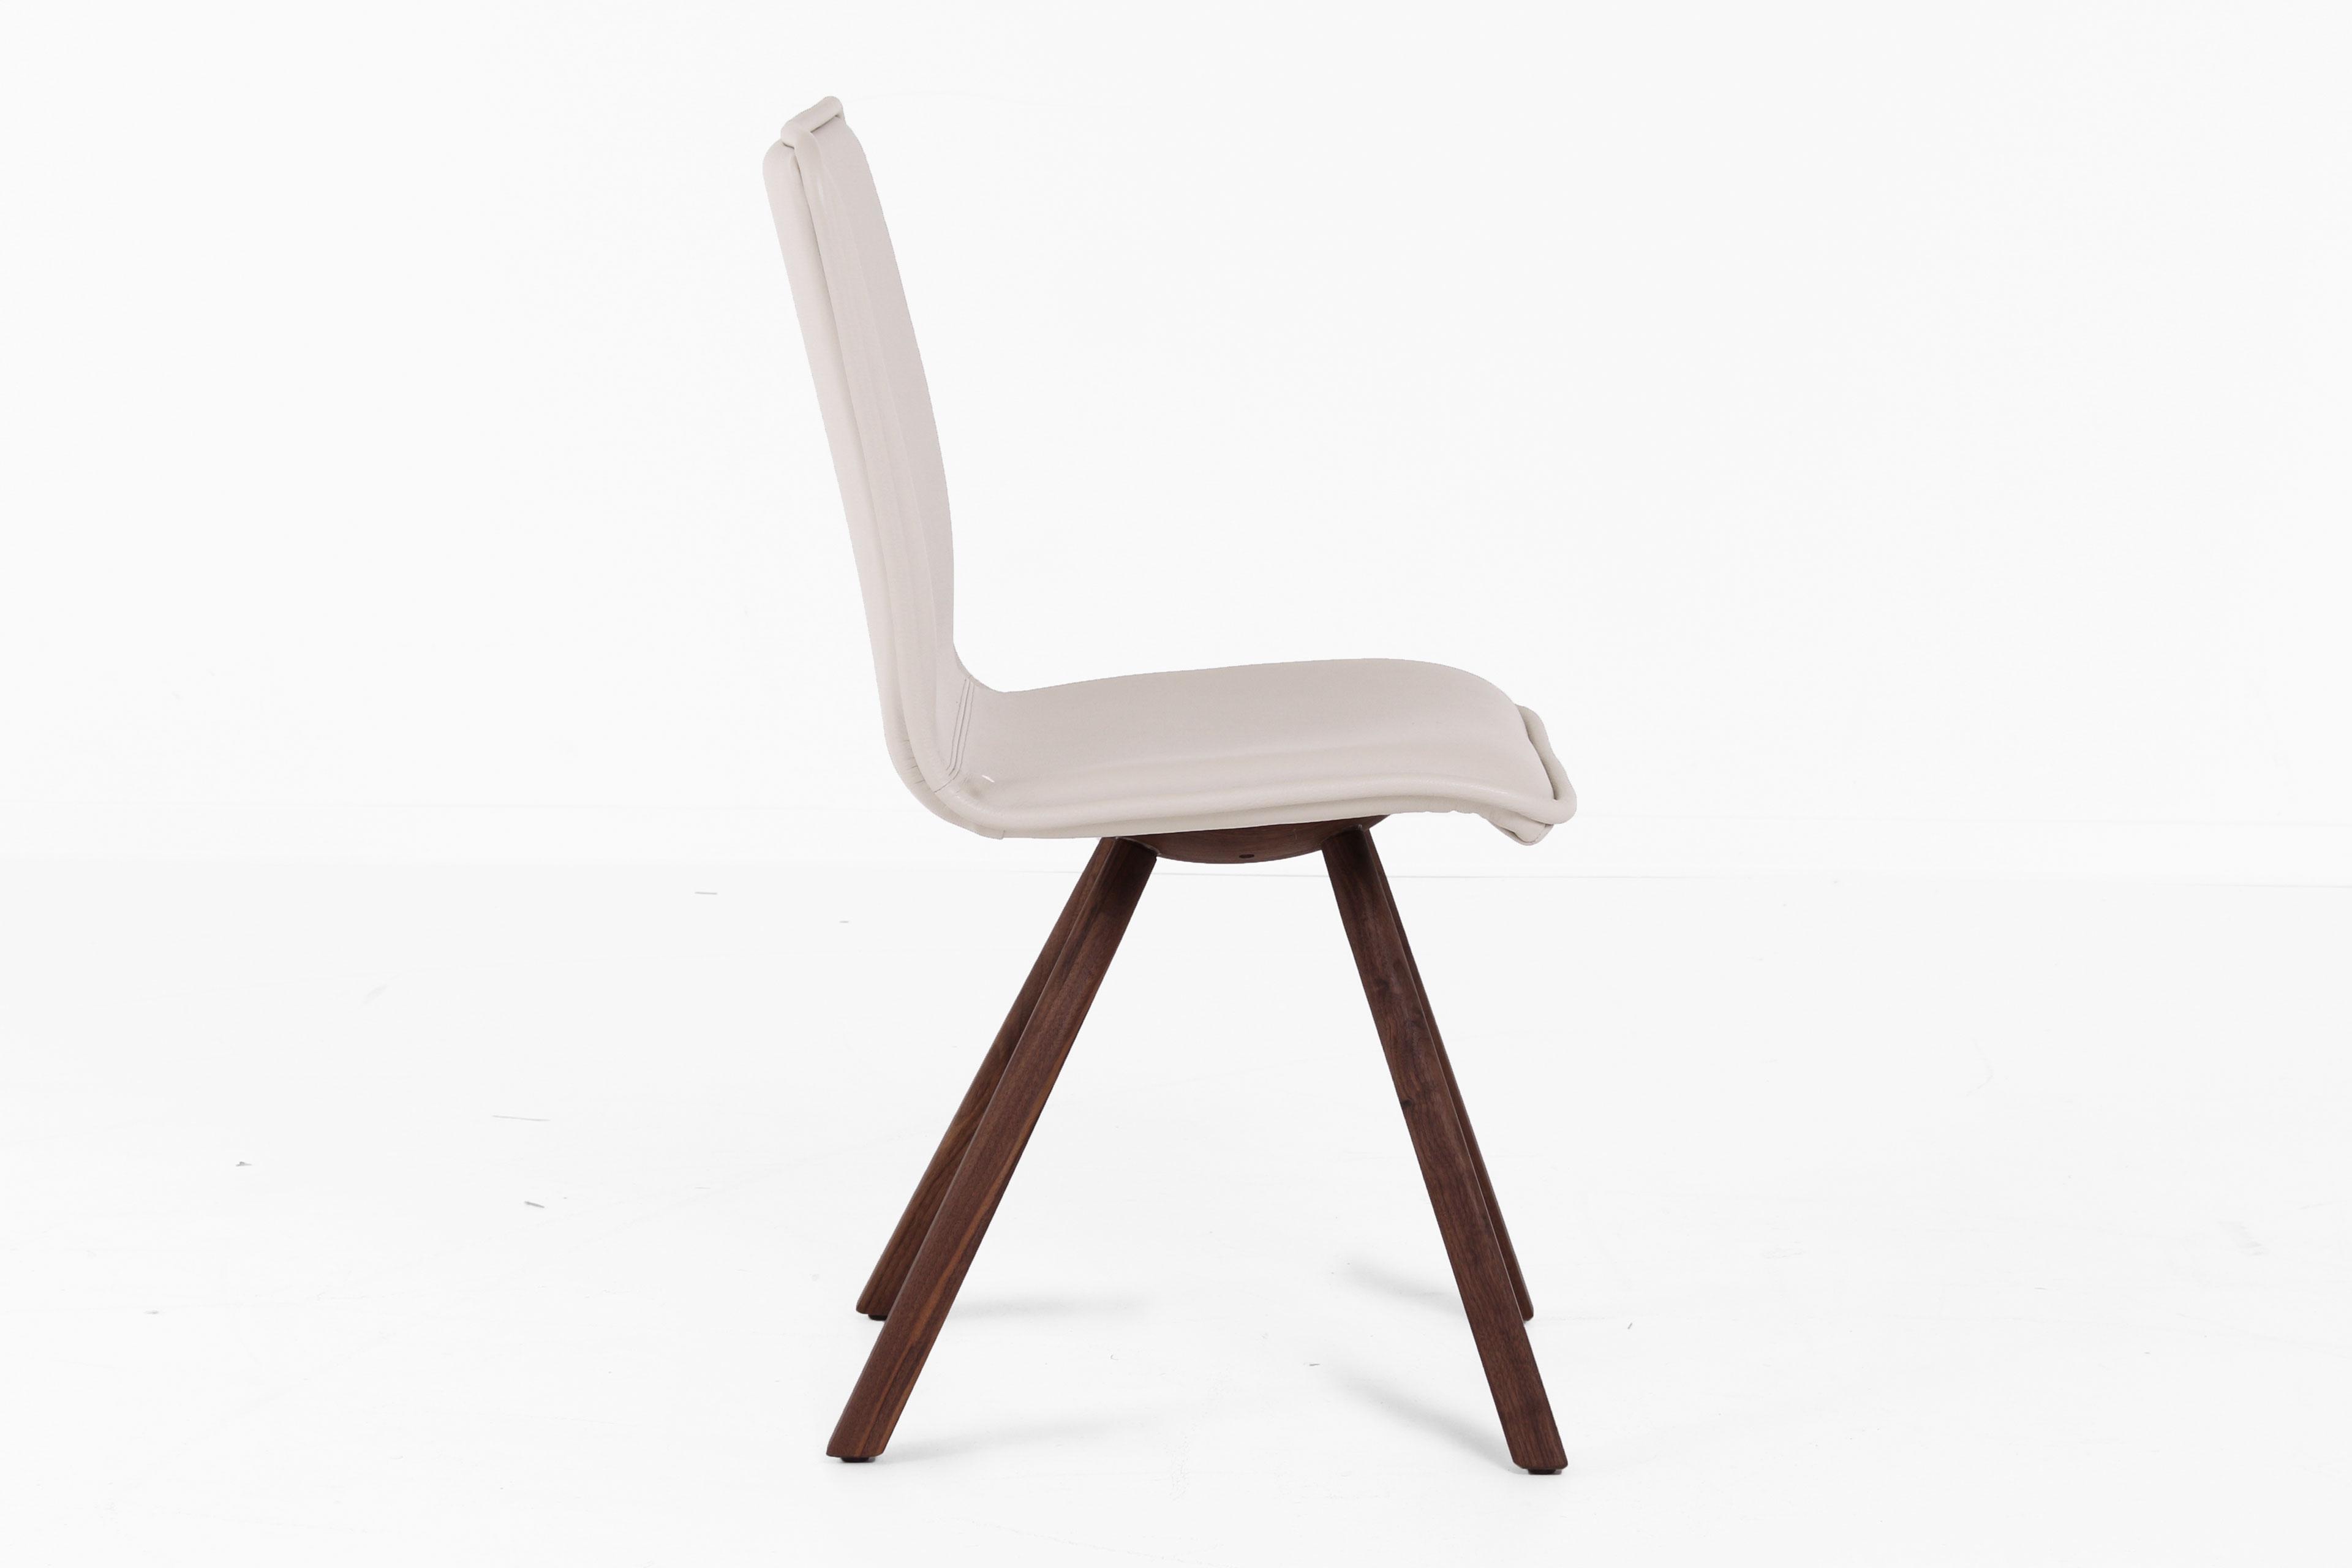 voglauer stuhl 46 wildnuss leder kiesel m bel letz. Black Bedroom Furniture Sets. Home Design Ideas